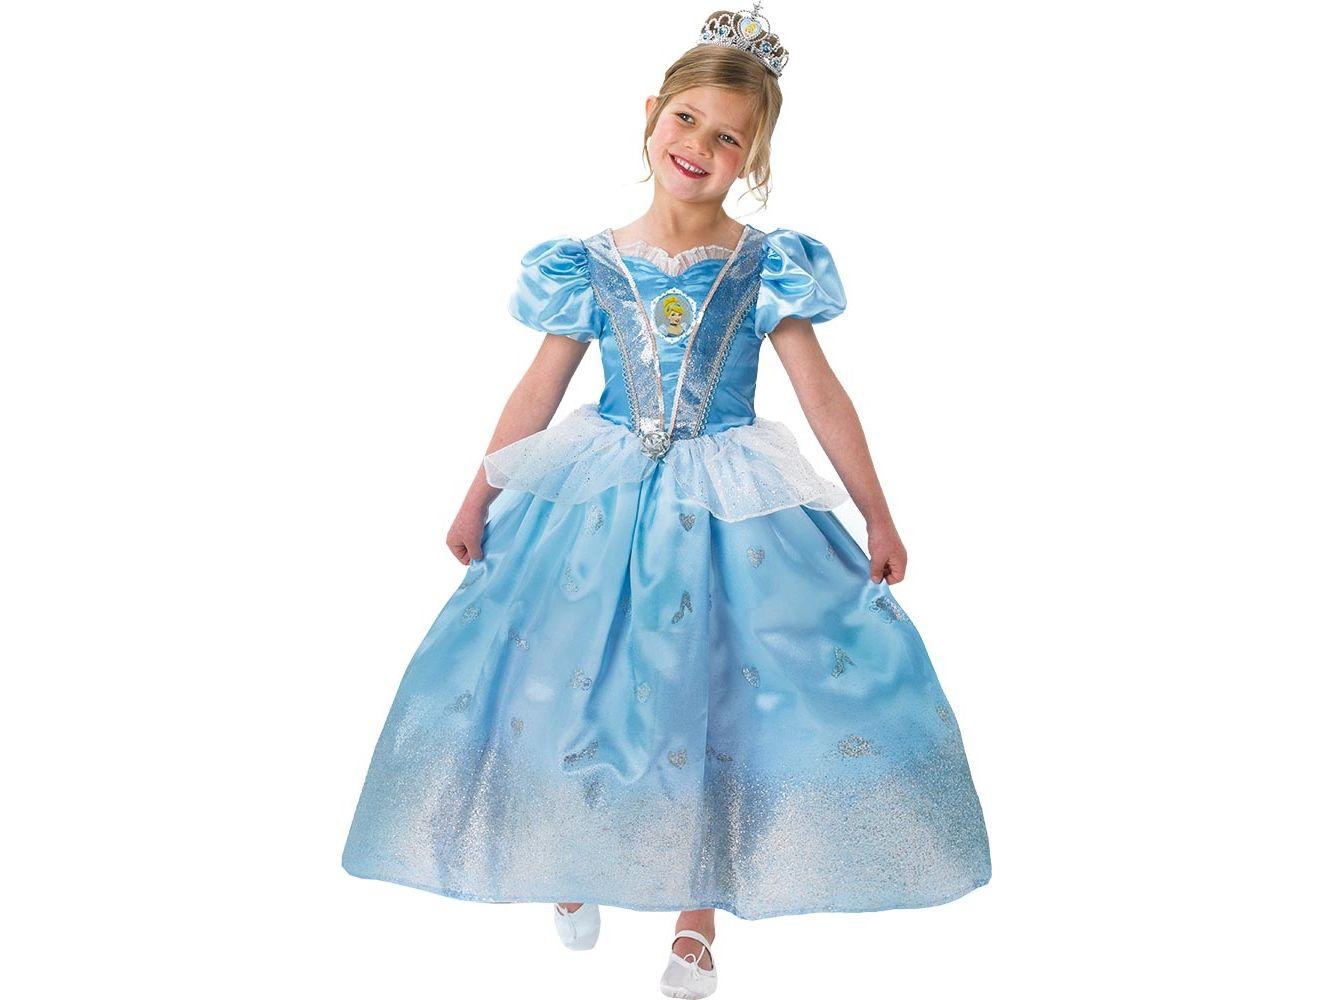 Bambina Cenerentola Costume Disney Linea 880030 Di Carnevale YxwTqgS